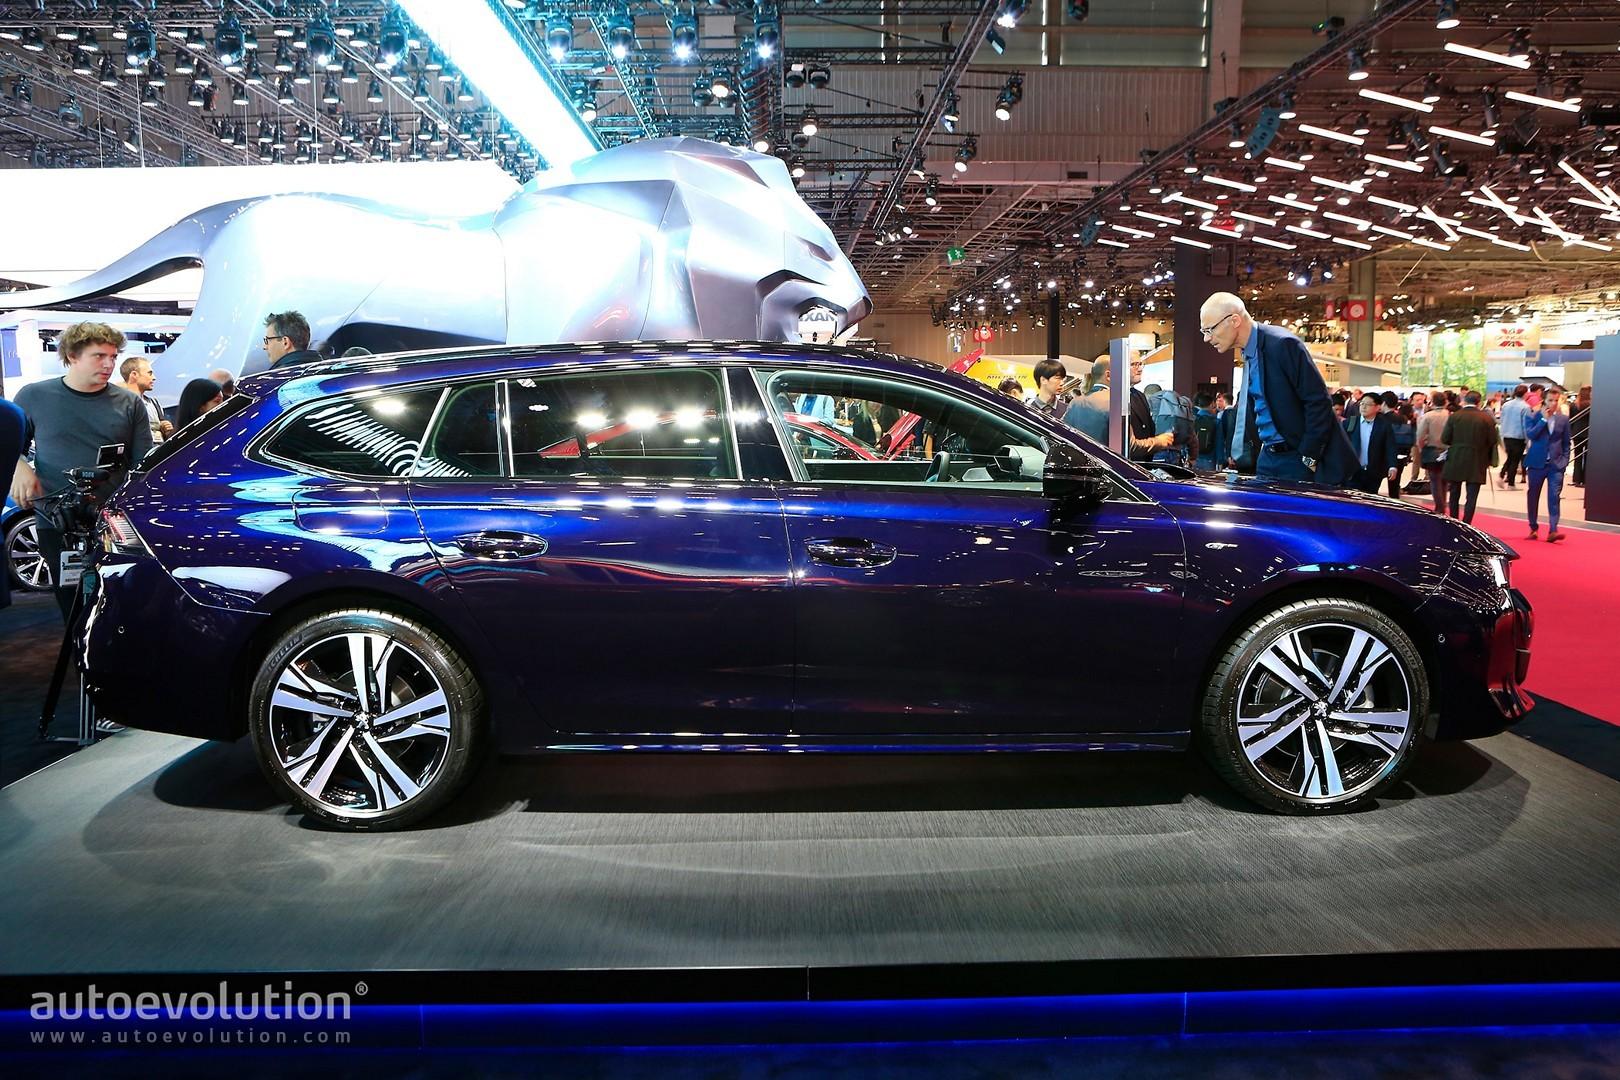 2019 Peugeot 508 Gt Is A 225 Hp Lightweight Wagon In Paris